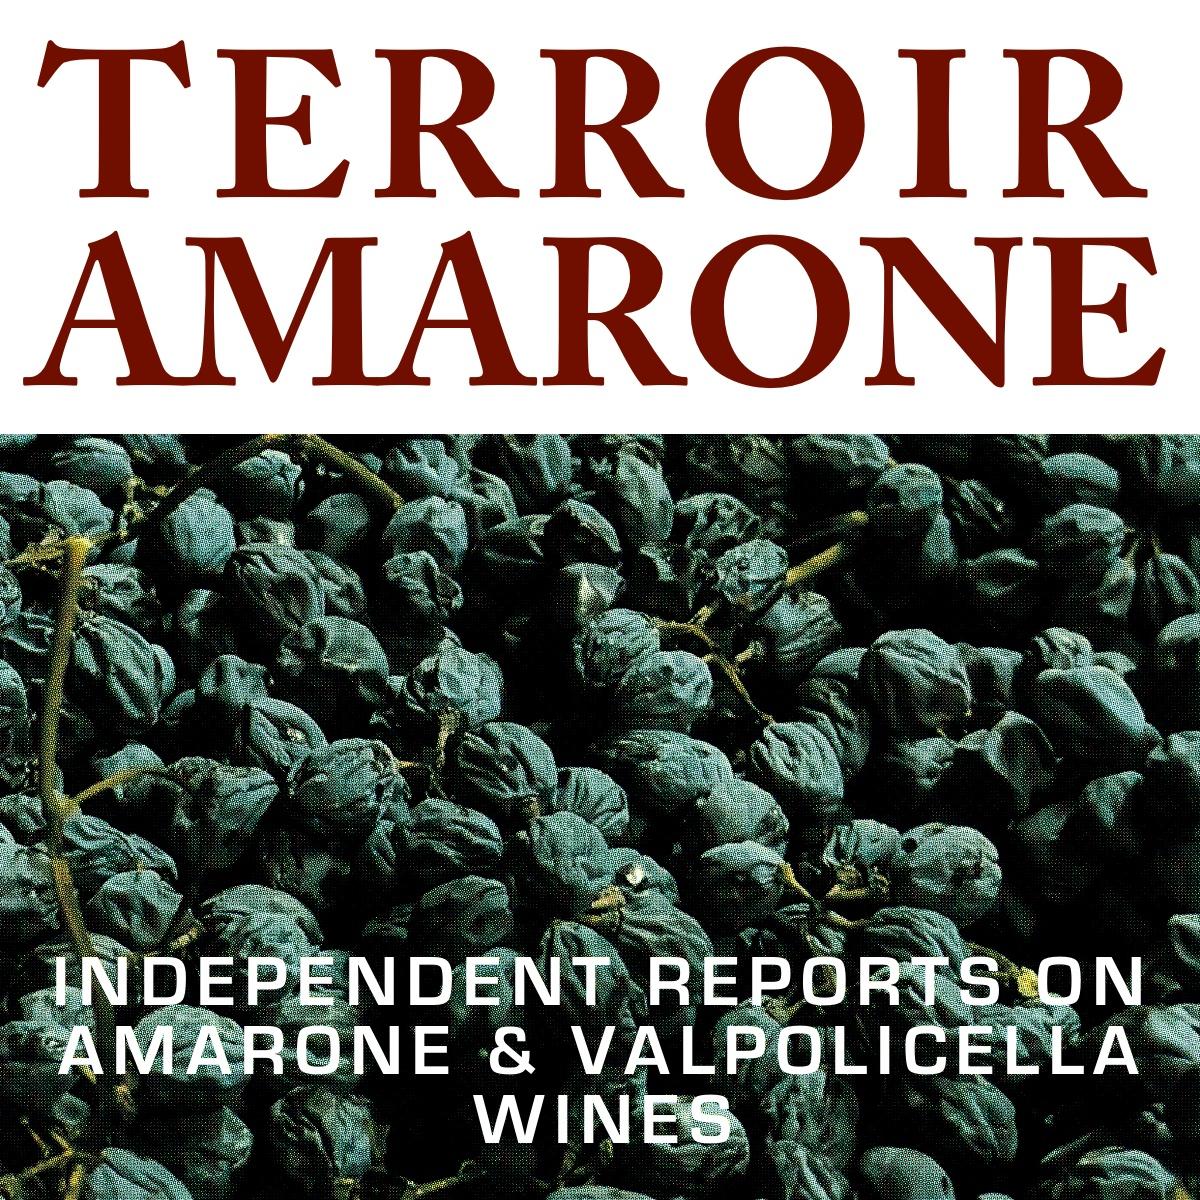 Terroir-Amarone-Logo-Manifesto-NEW-2014-6.jpg